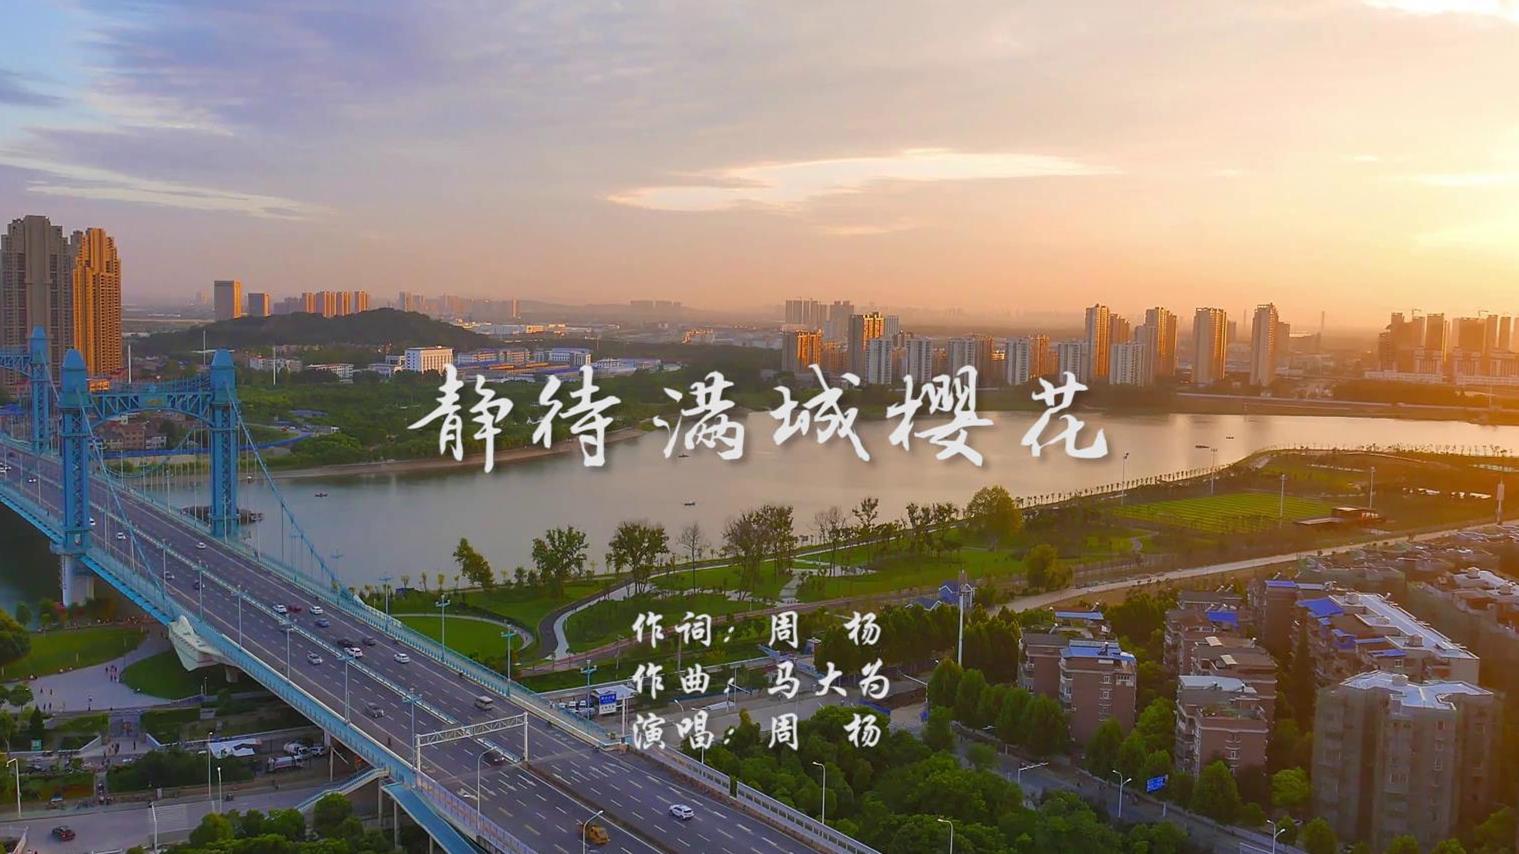 靜待滿城(cheng)櫻(ying)花MV 周楊(yang)封(feng)面圖.jpg